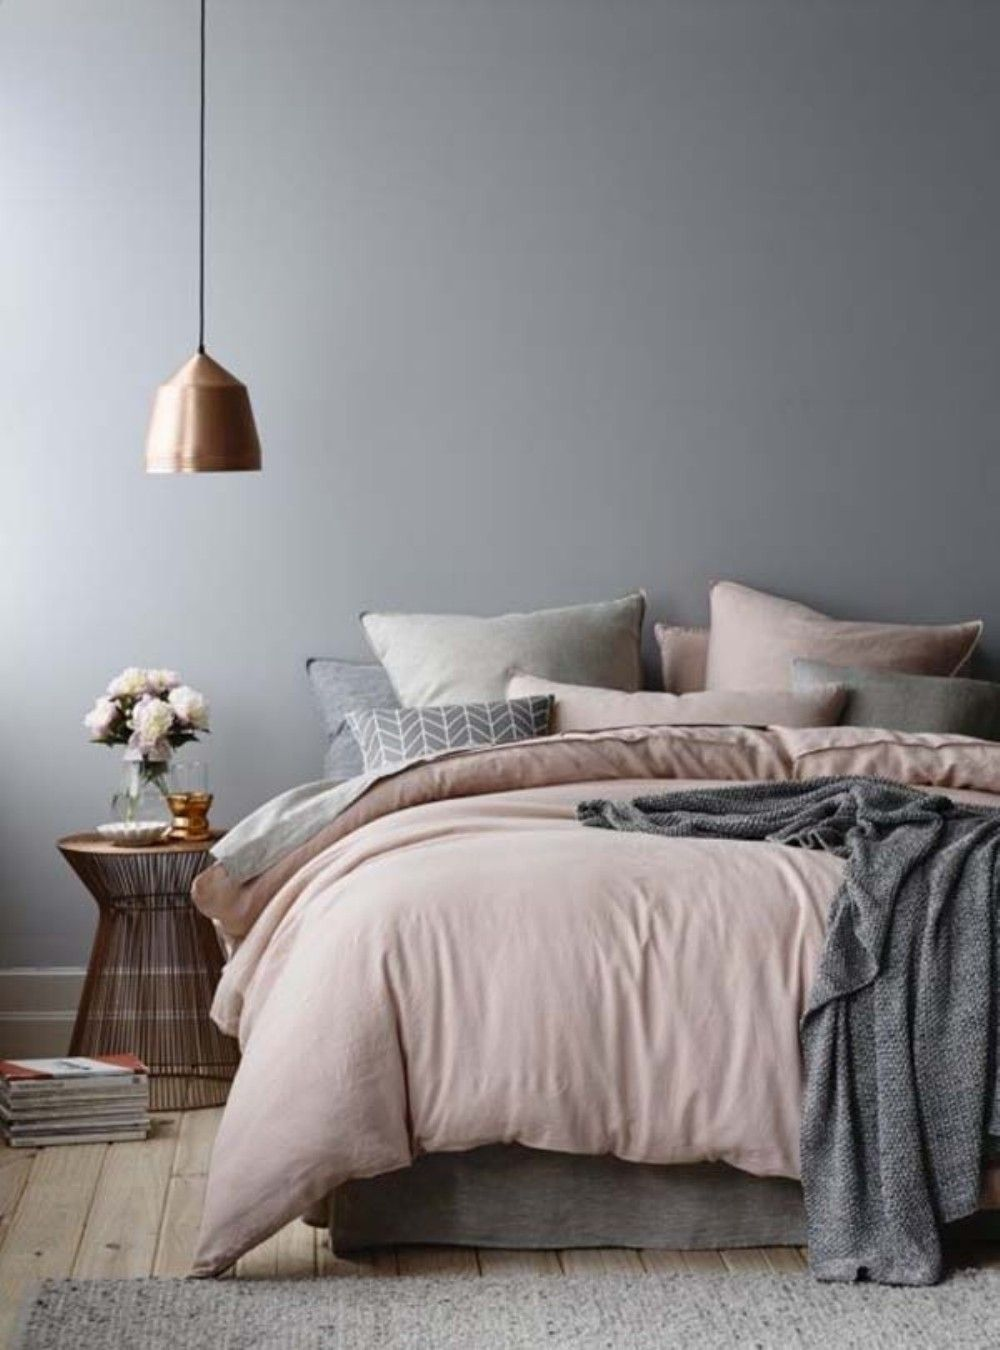 Best 25 Bedroom Sets Ideas On Pinterest: Best 25+ Scandinavian Bedroom Design Ideas On Pinterest